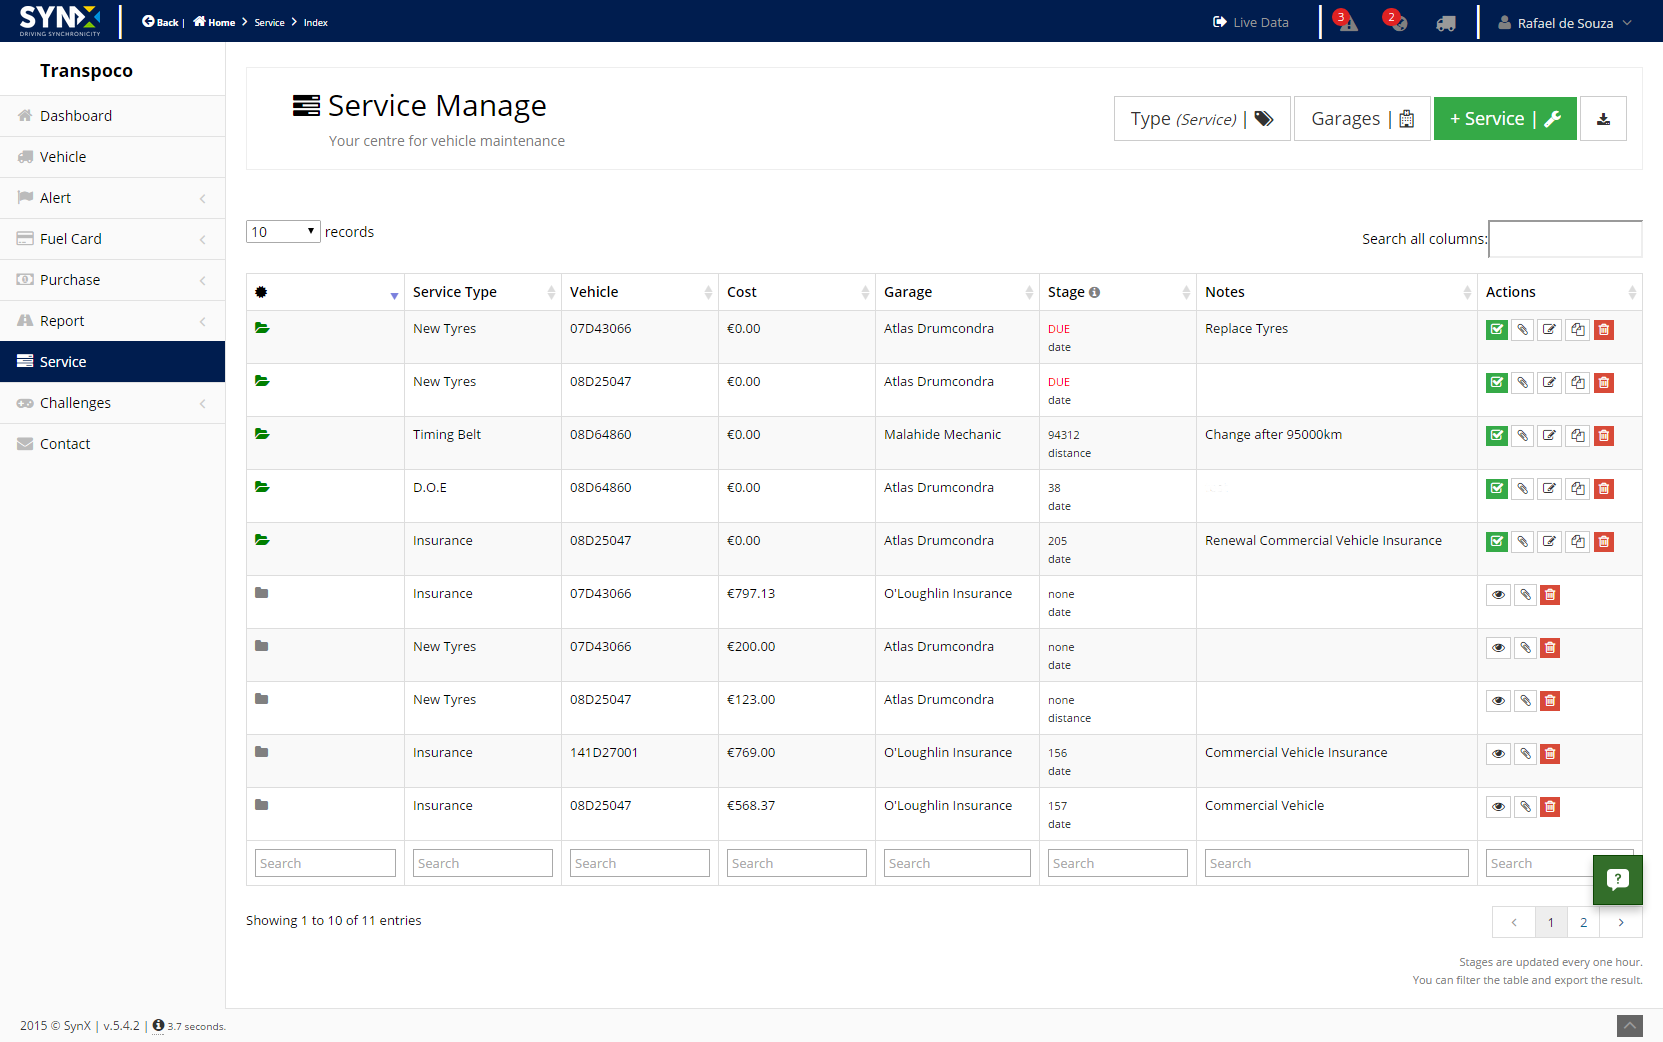 Service Index